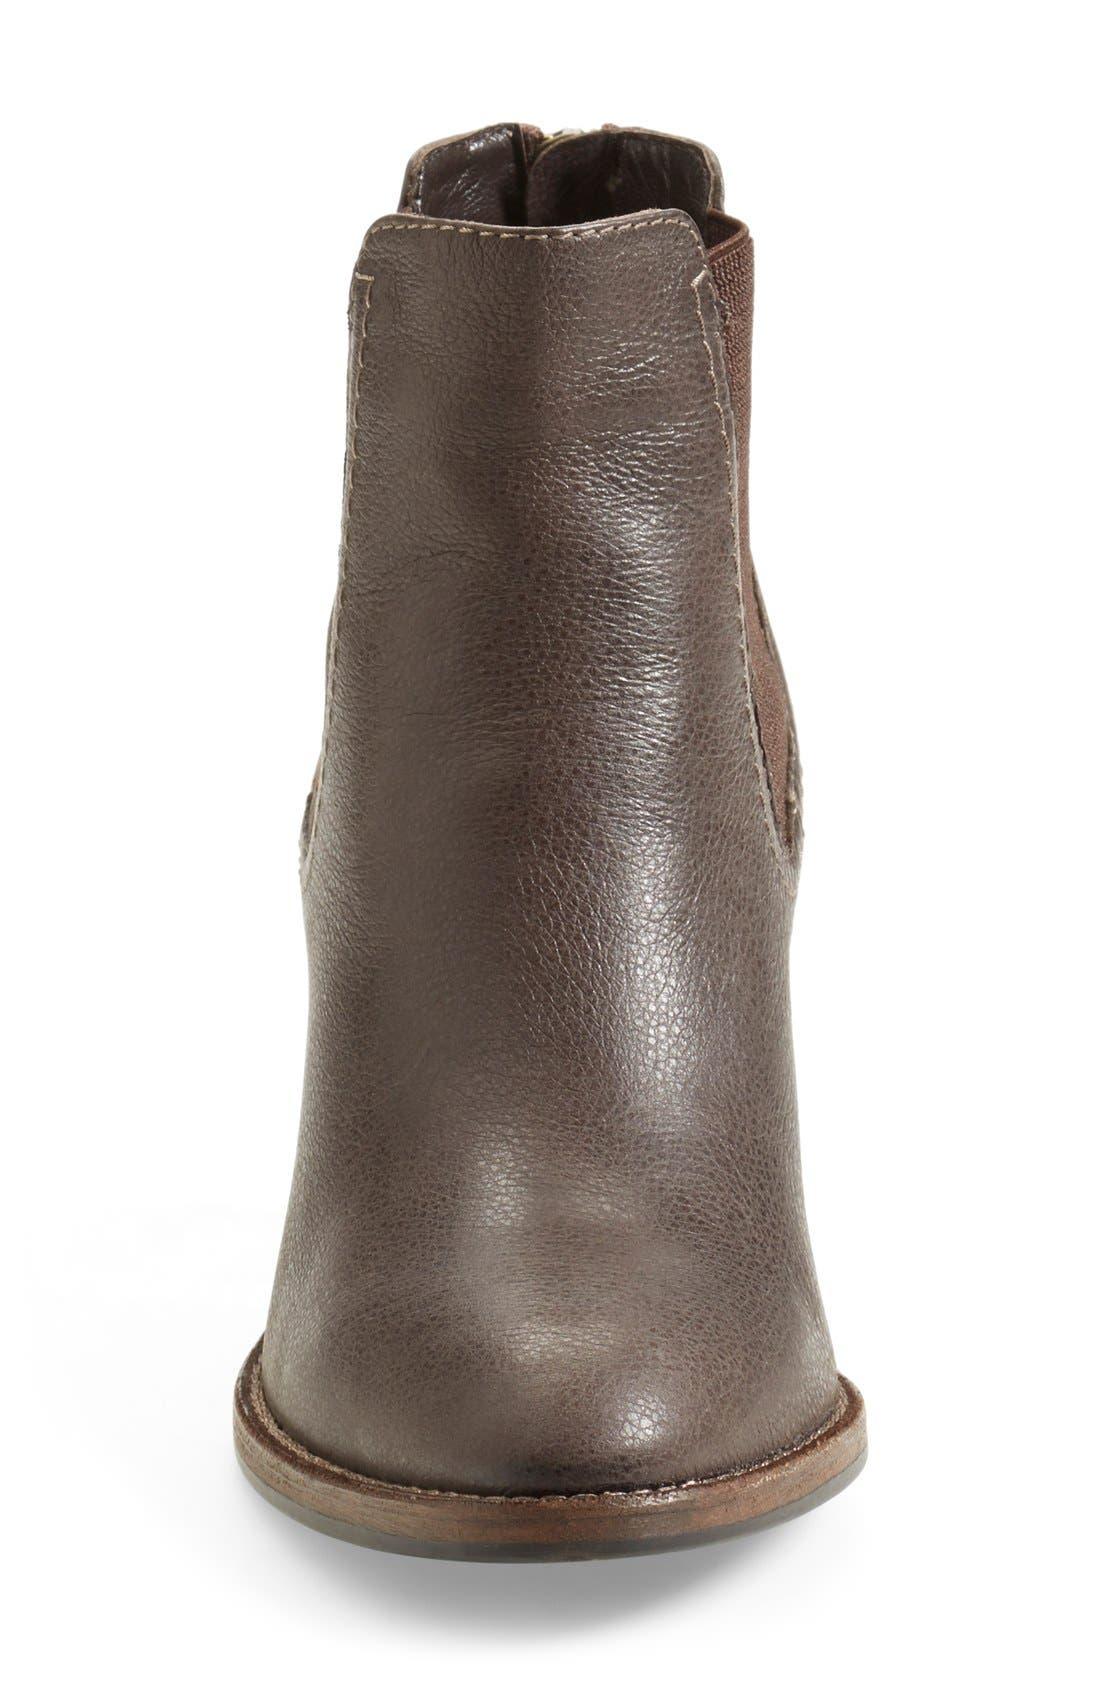 Alternate Image 3  - Aquatalia 'Fairly' Weatherproof Ankle Bootie (Women)